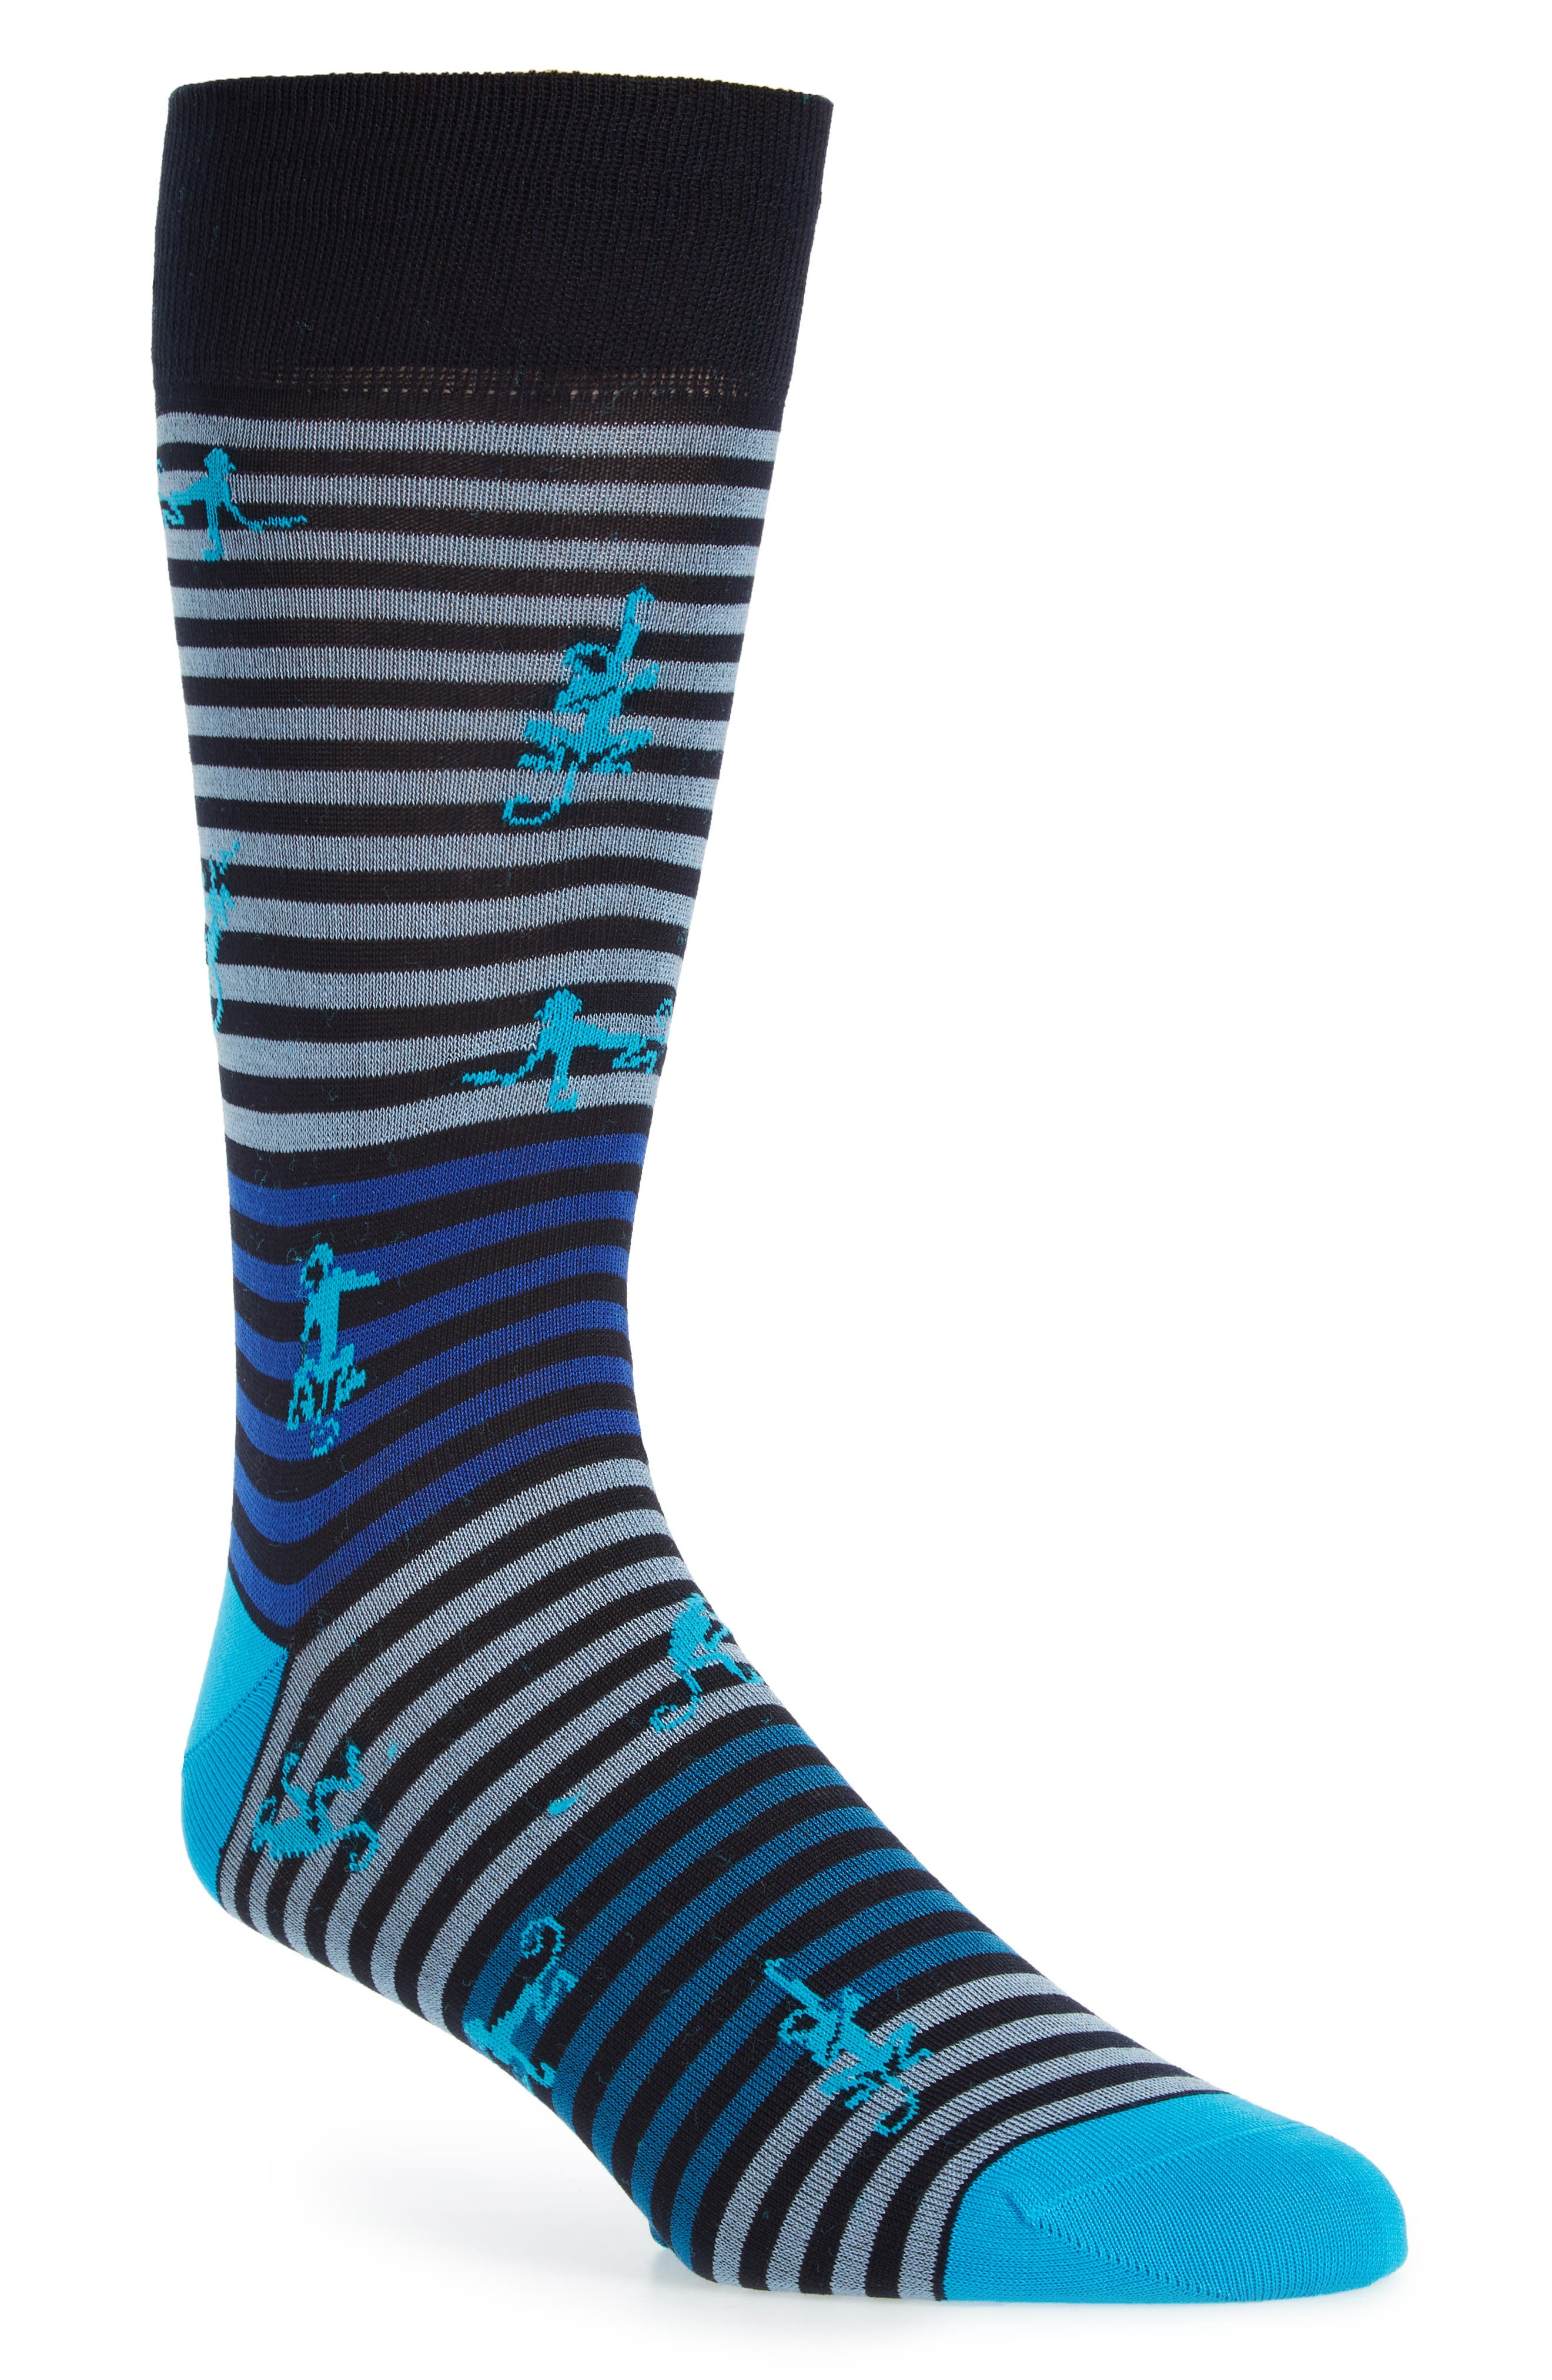 Monkey Mercerized Cotton Blend Socks,                         Main,                         color, AQUA